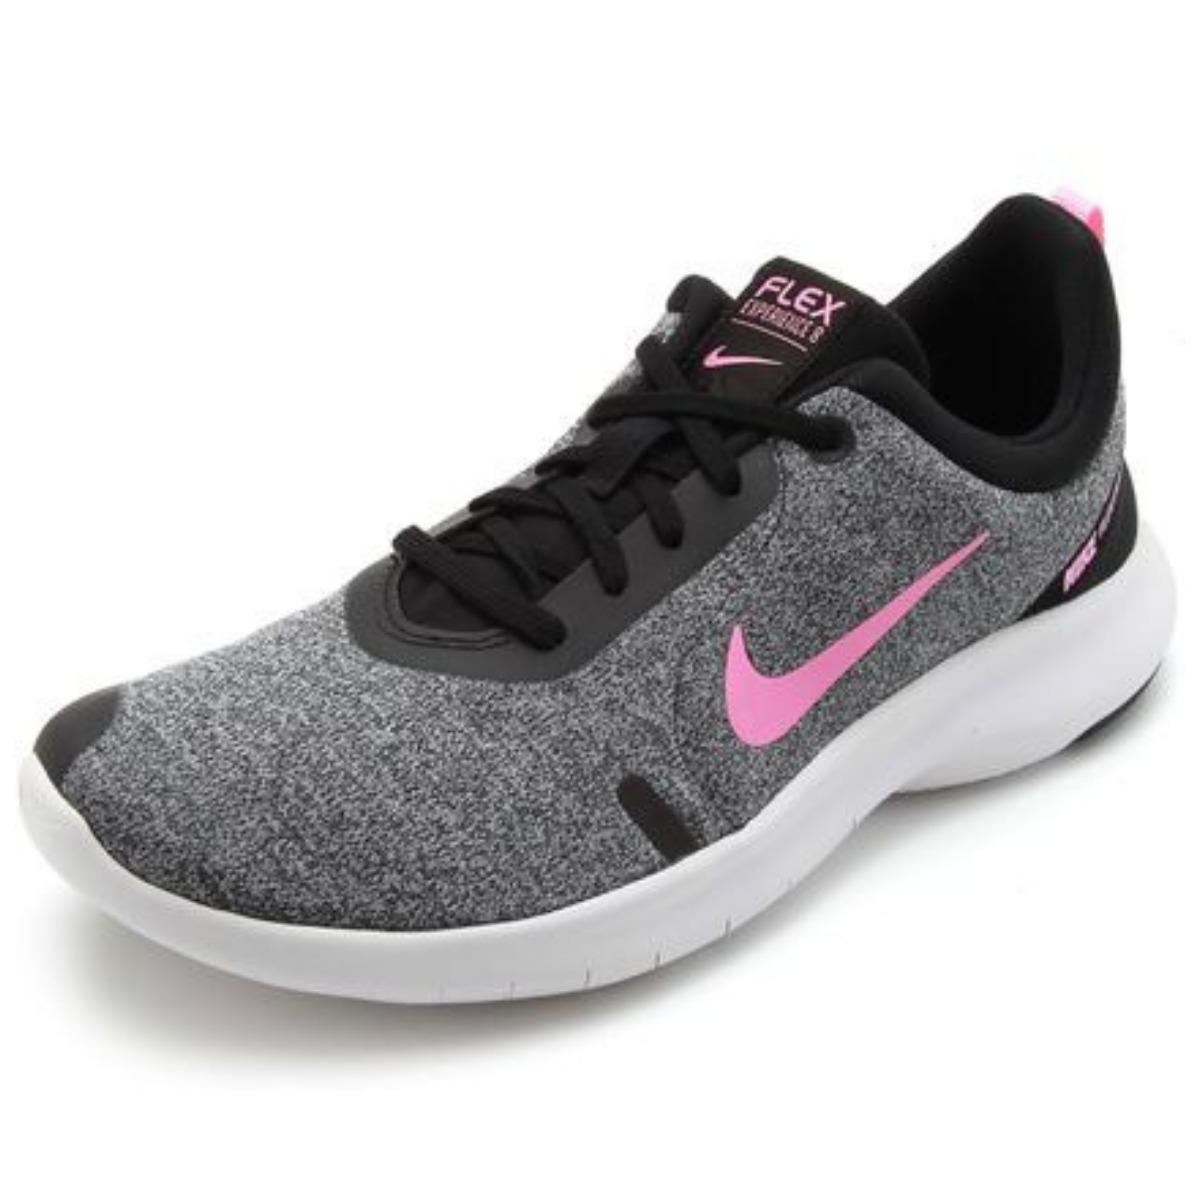 69d997051 Tênis Nike Feminino Flex Experience Rn 8 Cinza E Rosa R 27990. Tênis Nike  Flex Bijoux Feminino Decker Online